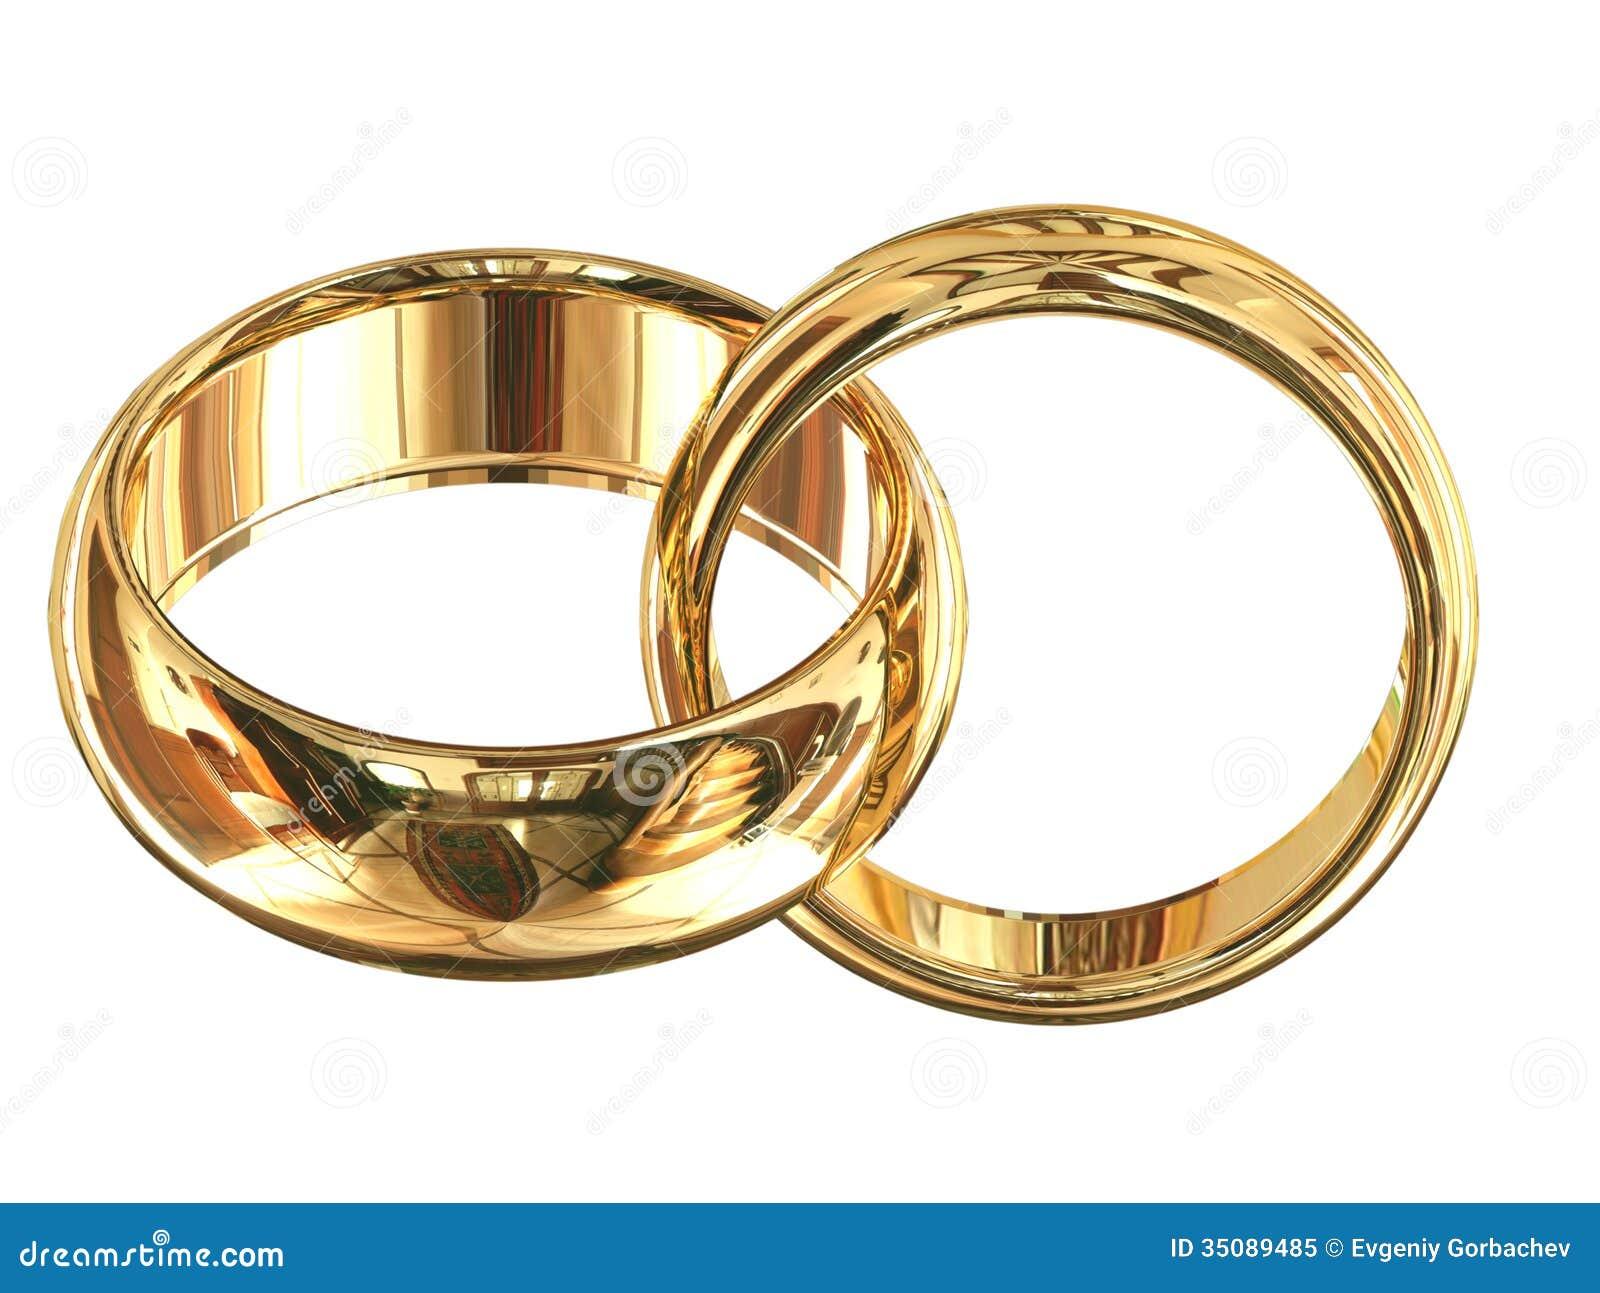 Wedding Rings Isolated Royalty Free Stock Photo